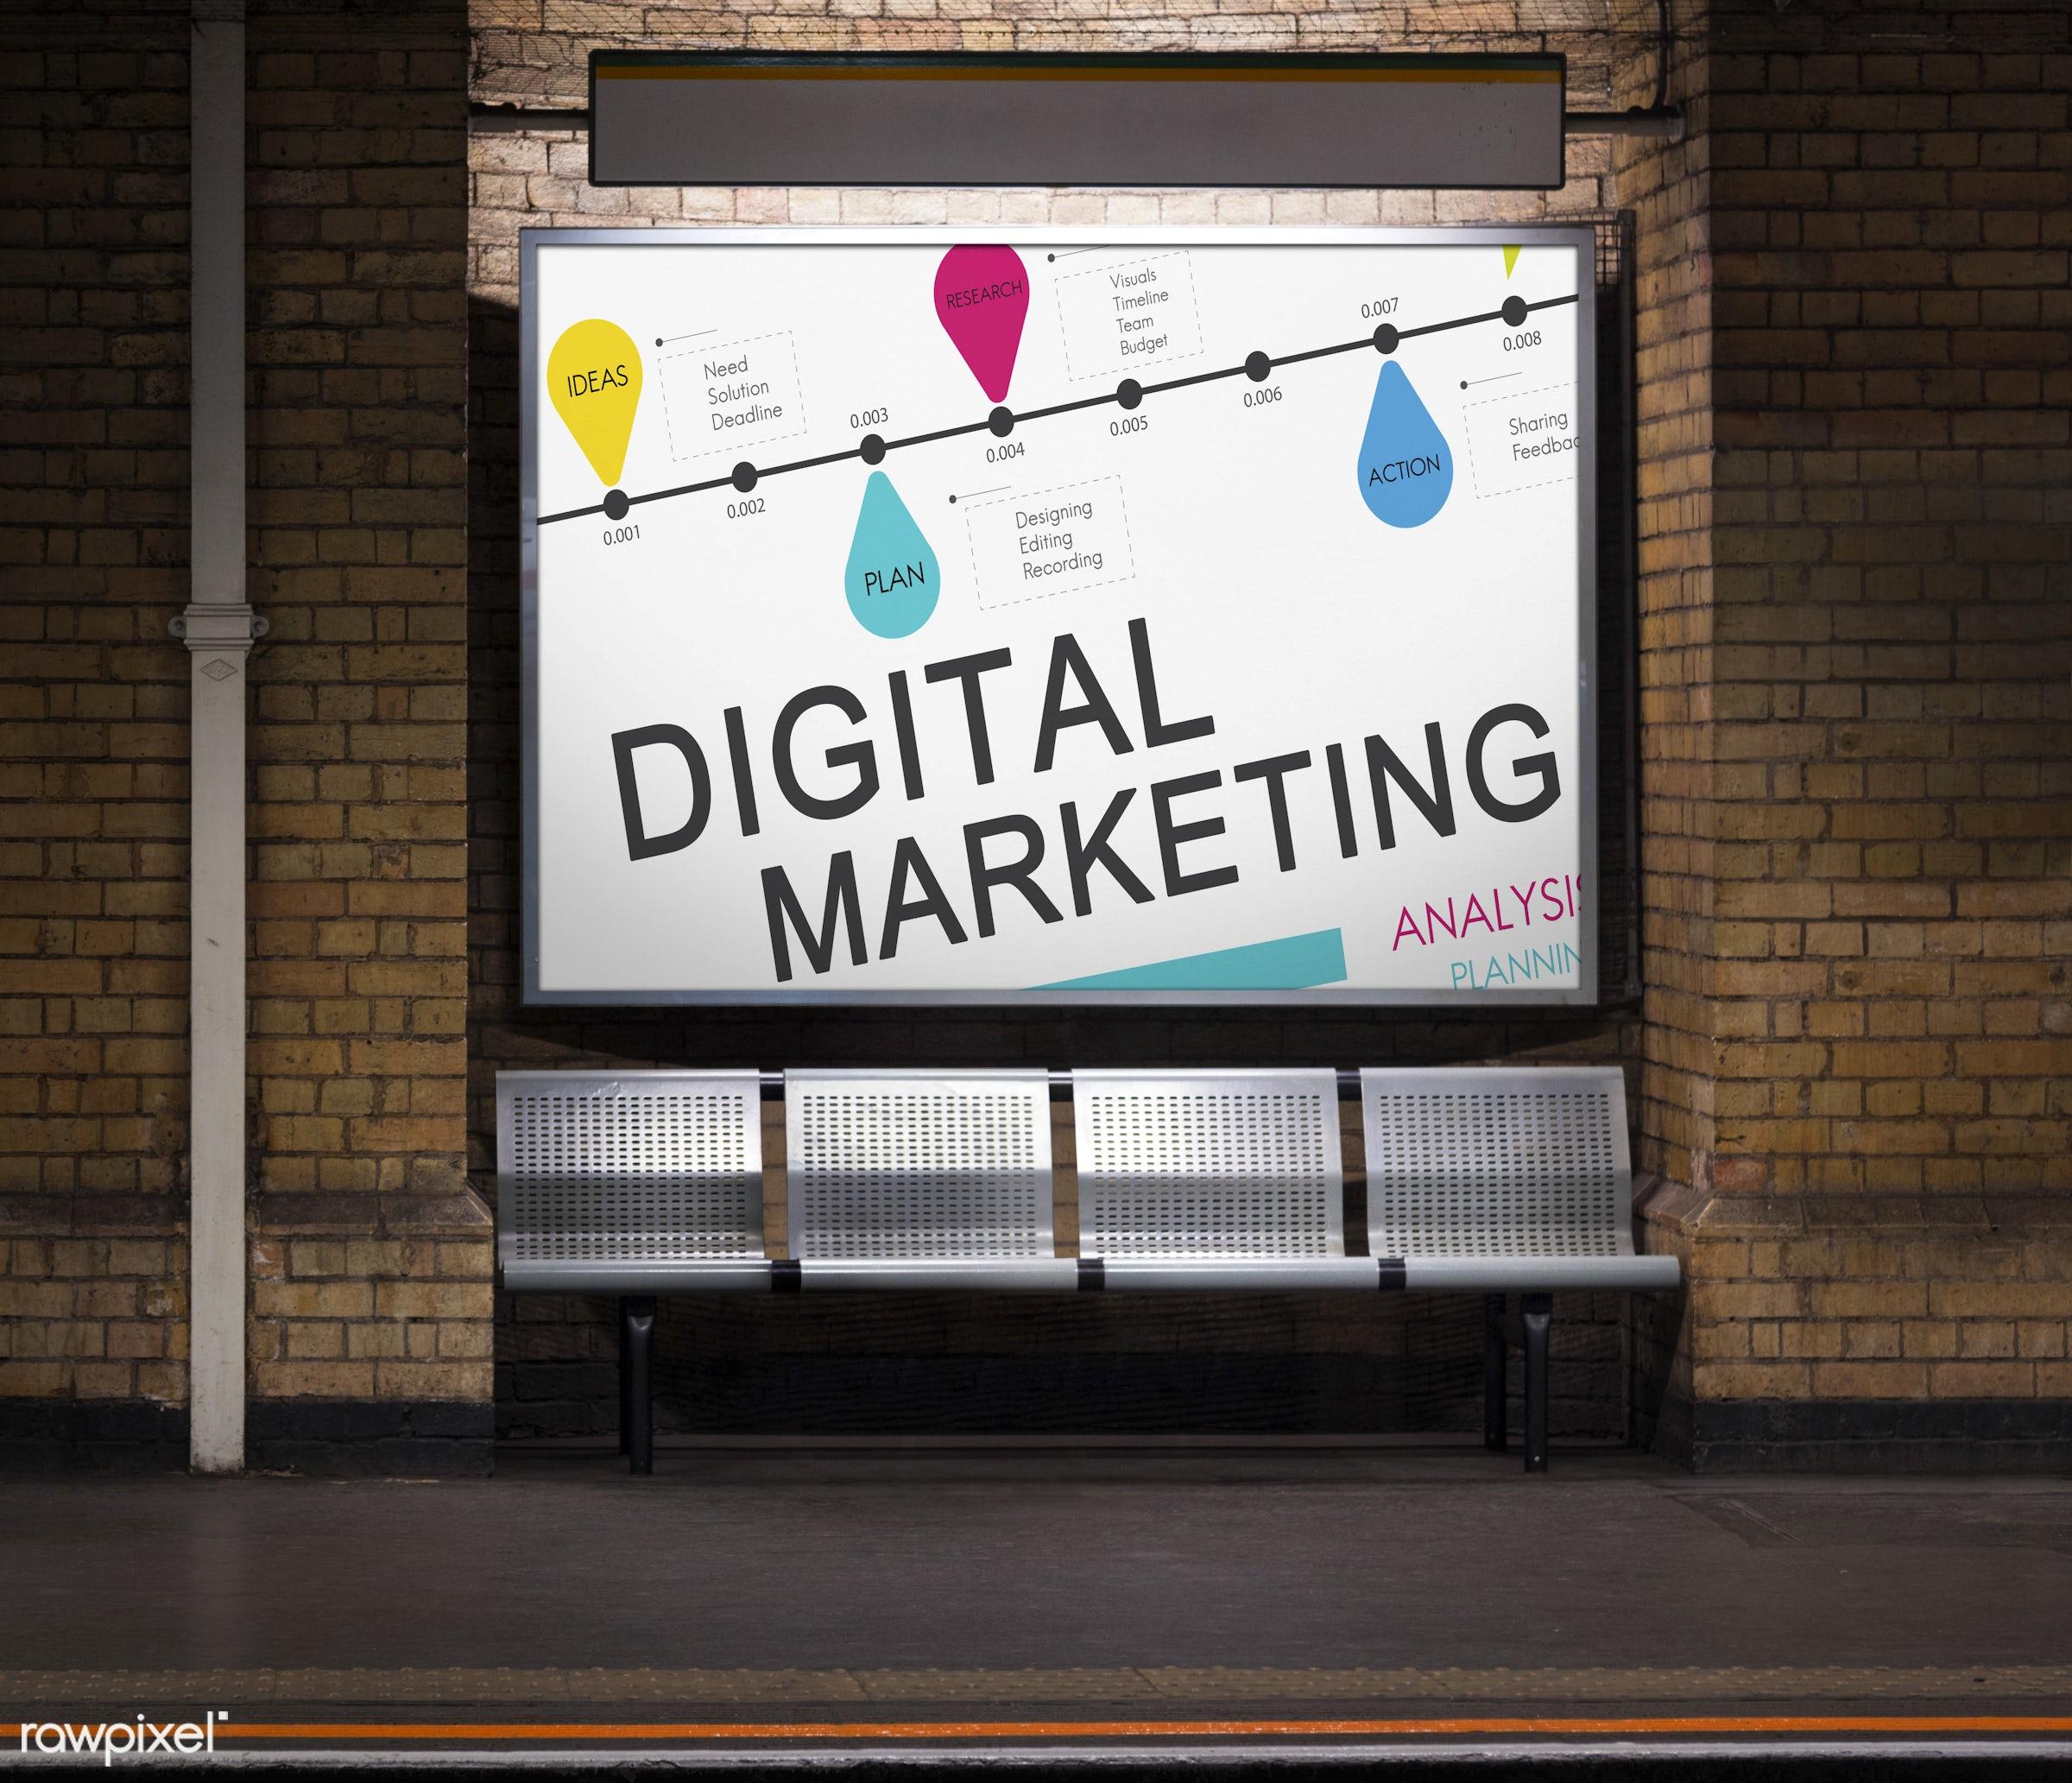 action, advertising, analysis, analyzing, brainstorm, branding, bricks, brickswall, business, data, digital,...